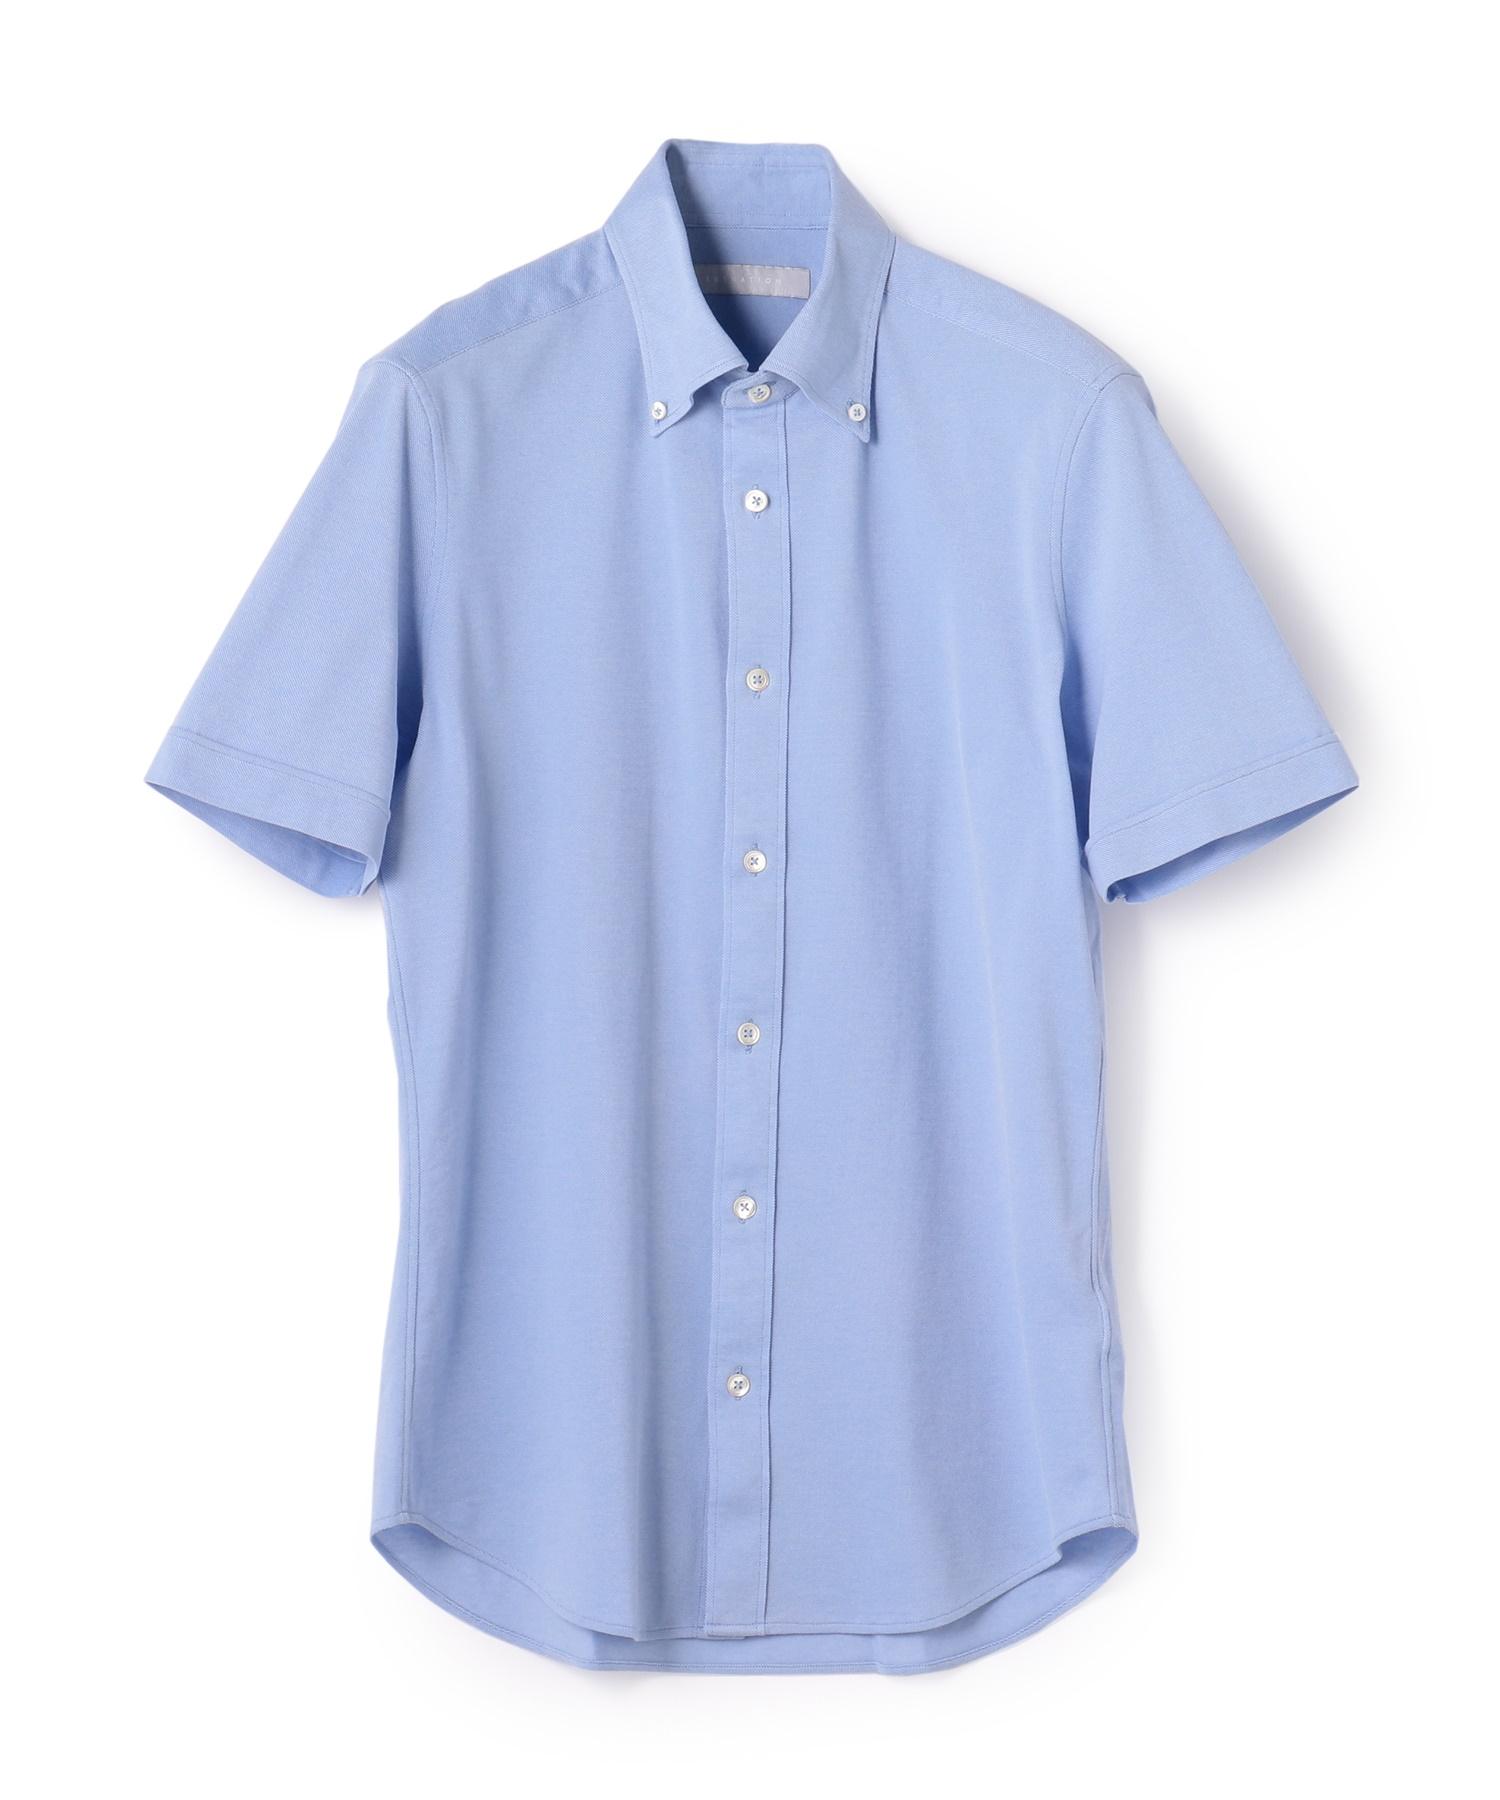 ESTNATION / 鹿の子ボタンダウン半袖シャツ